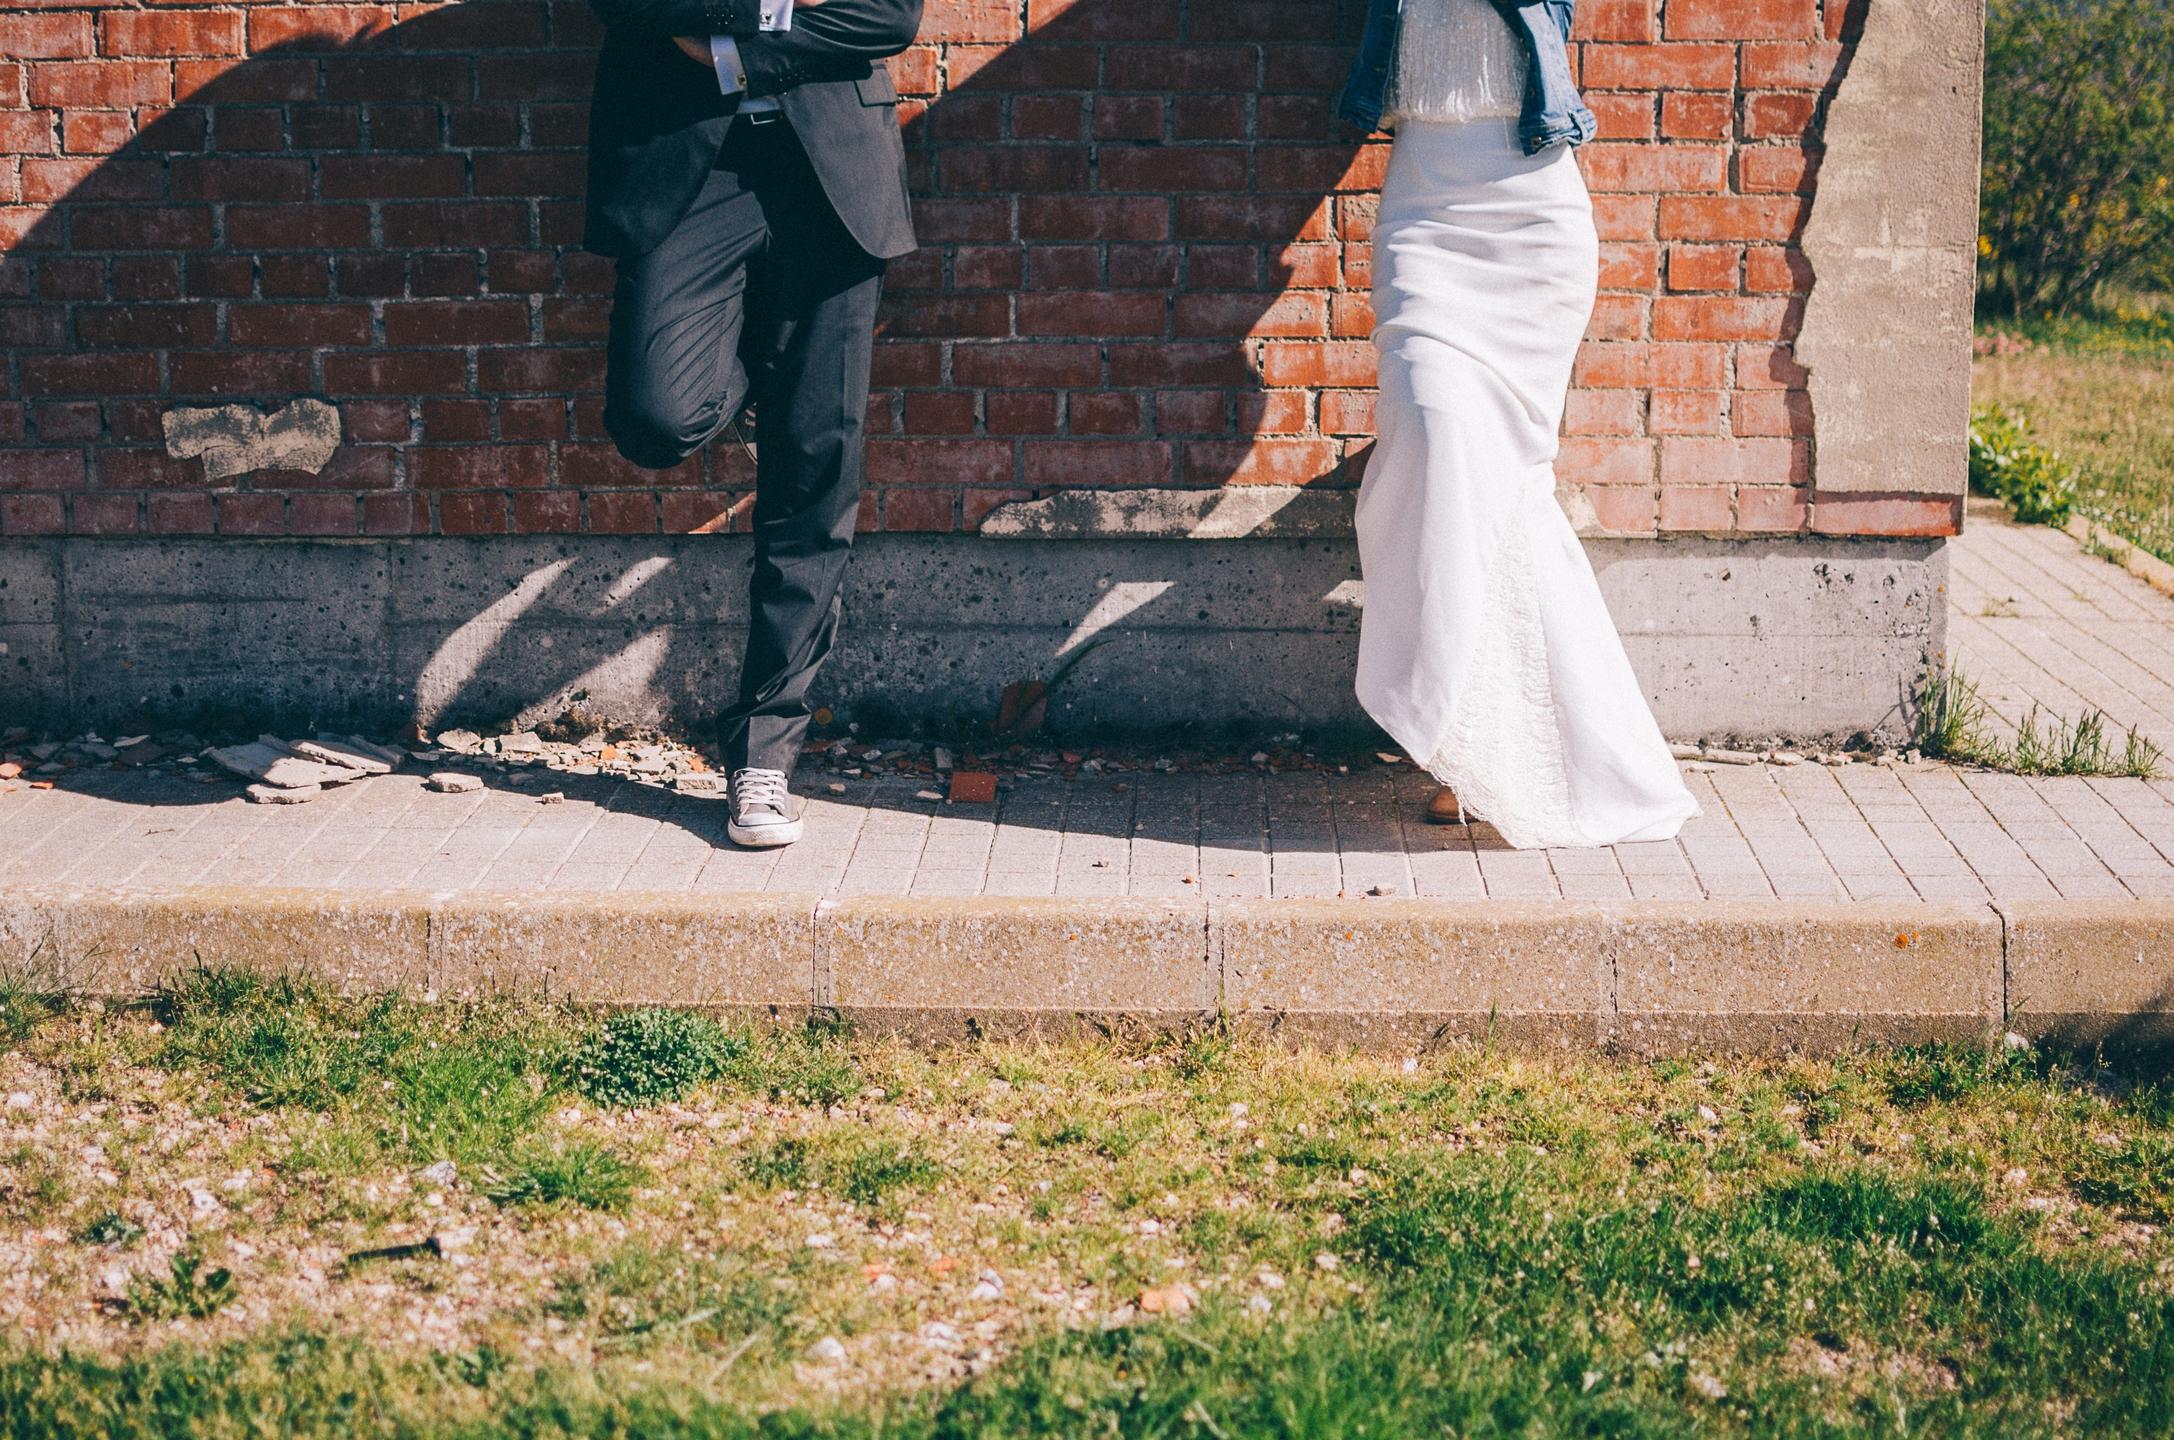 Martín Valle Fotógrafos (@martinvallefoto) Cover Image